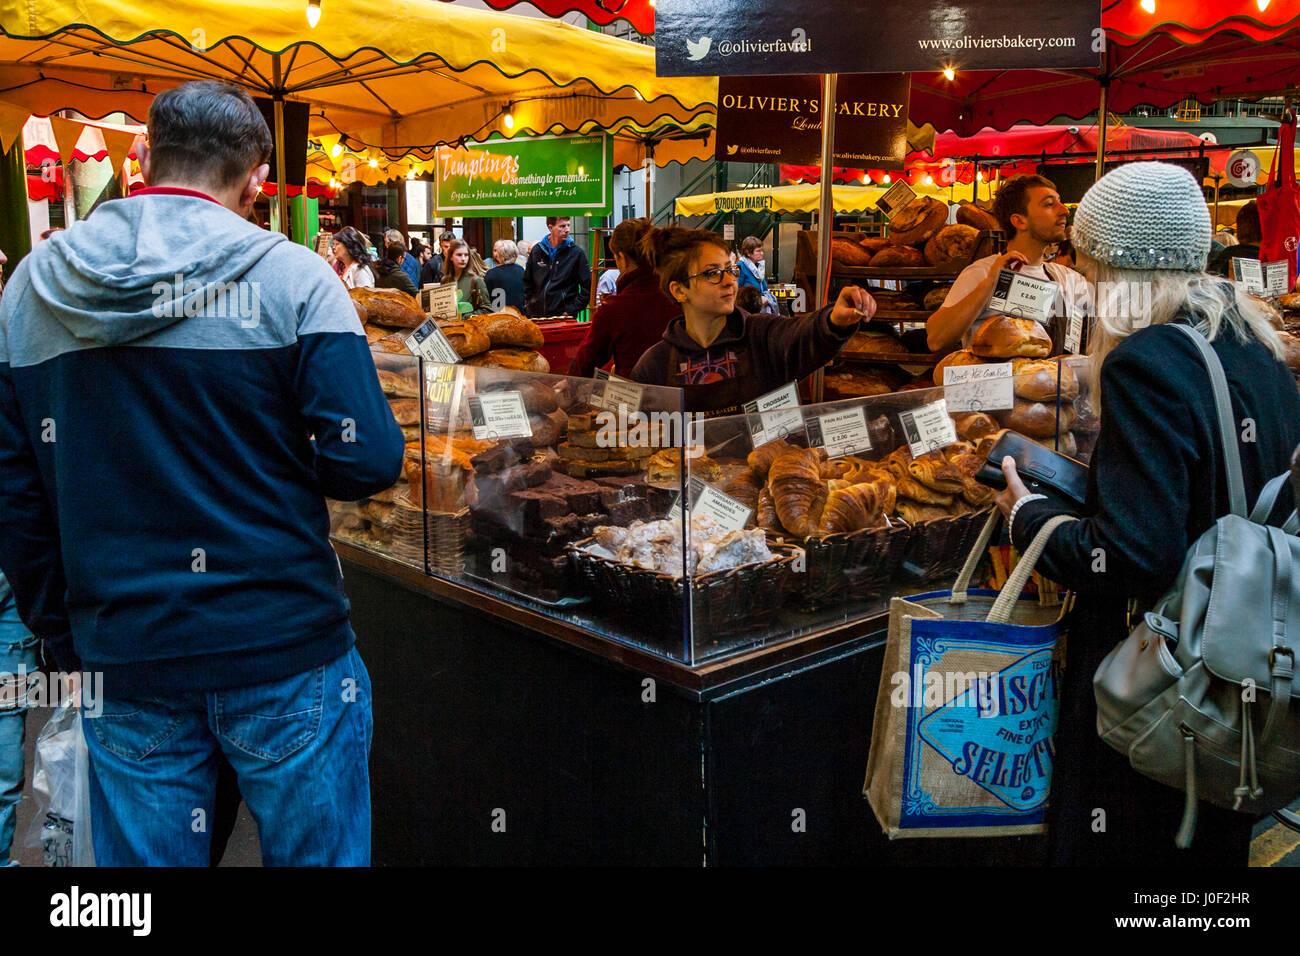 People Shopping At Olivier's Bakery In Borough Market, Southwark, London, England - Stock Image